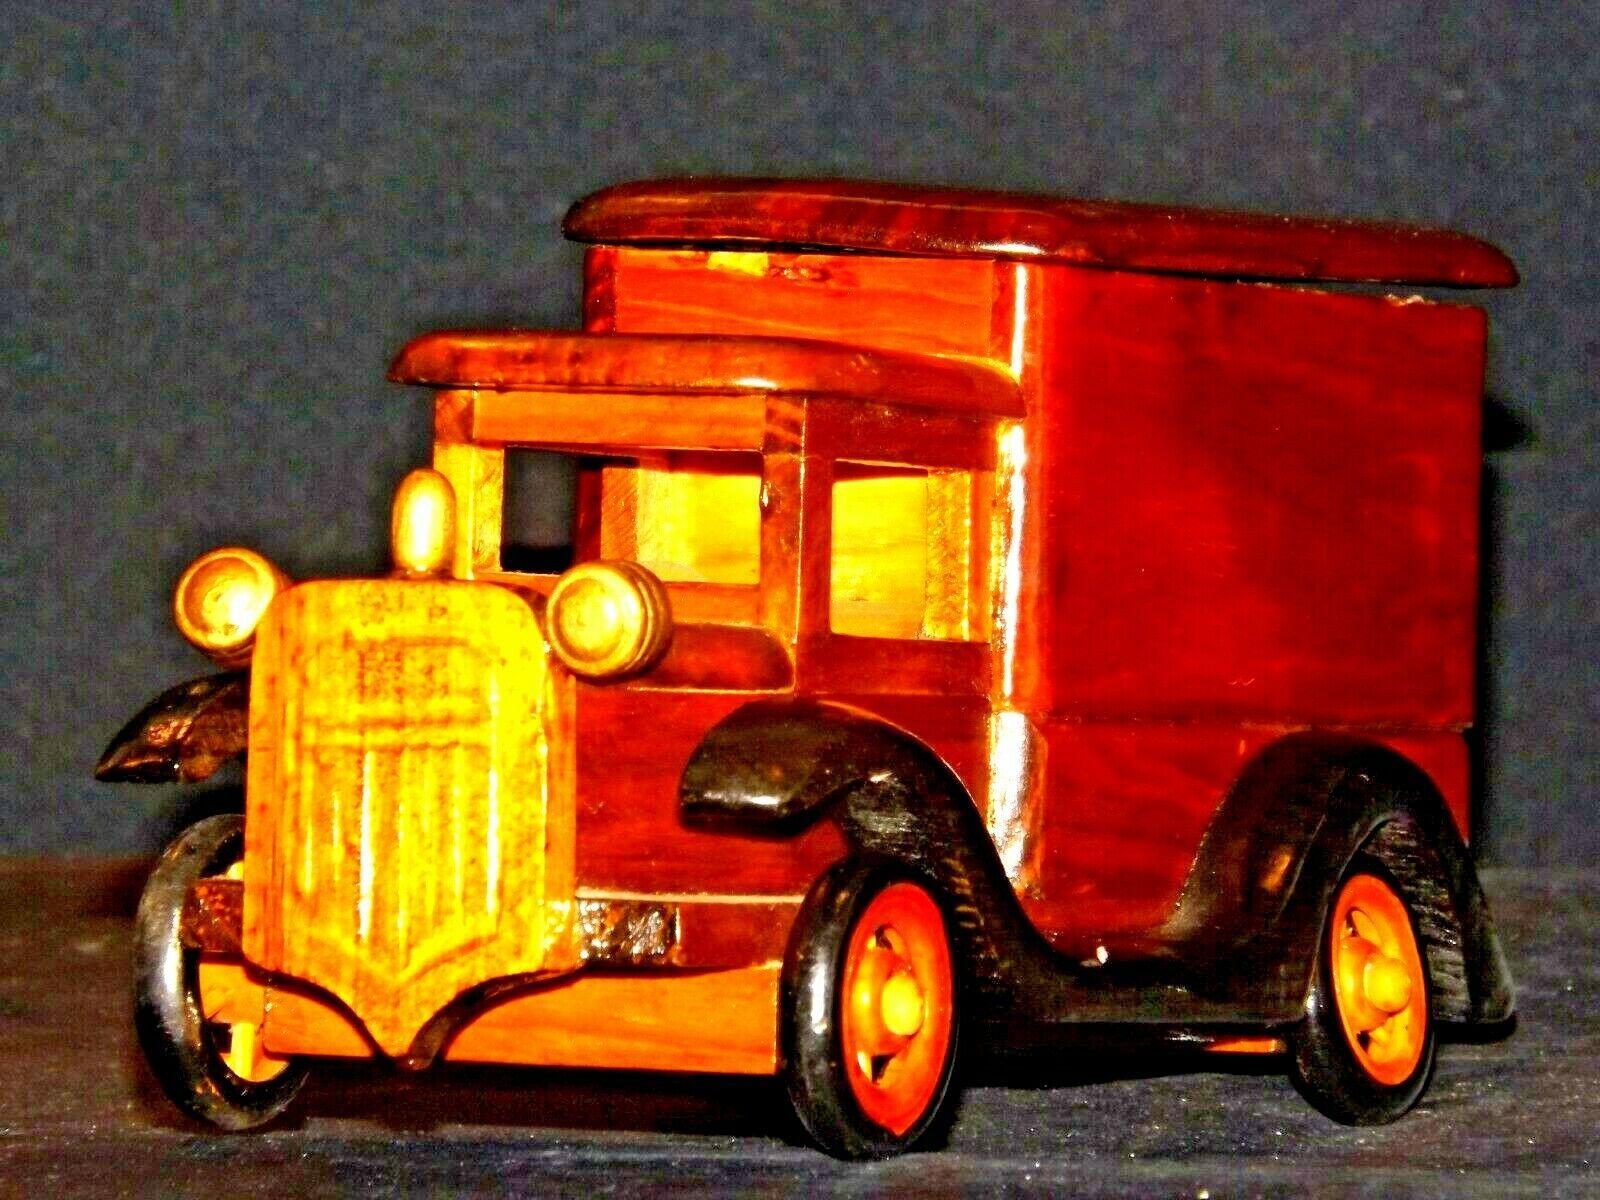 Wooden Toy Milk Truck AA19-1569 Vintage